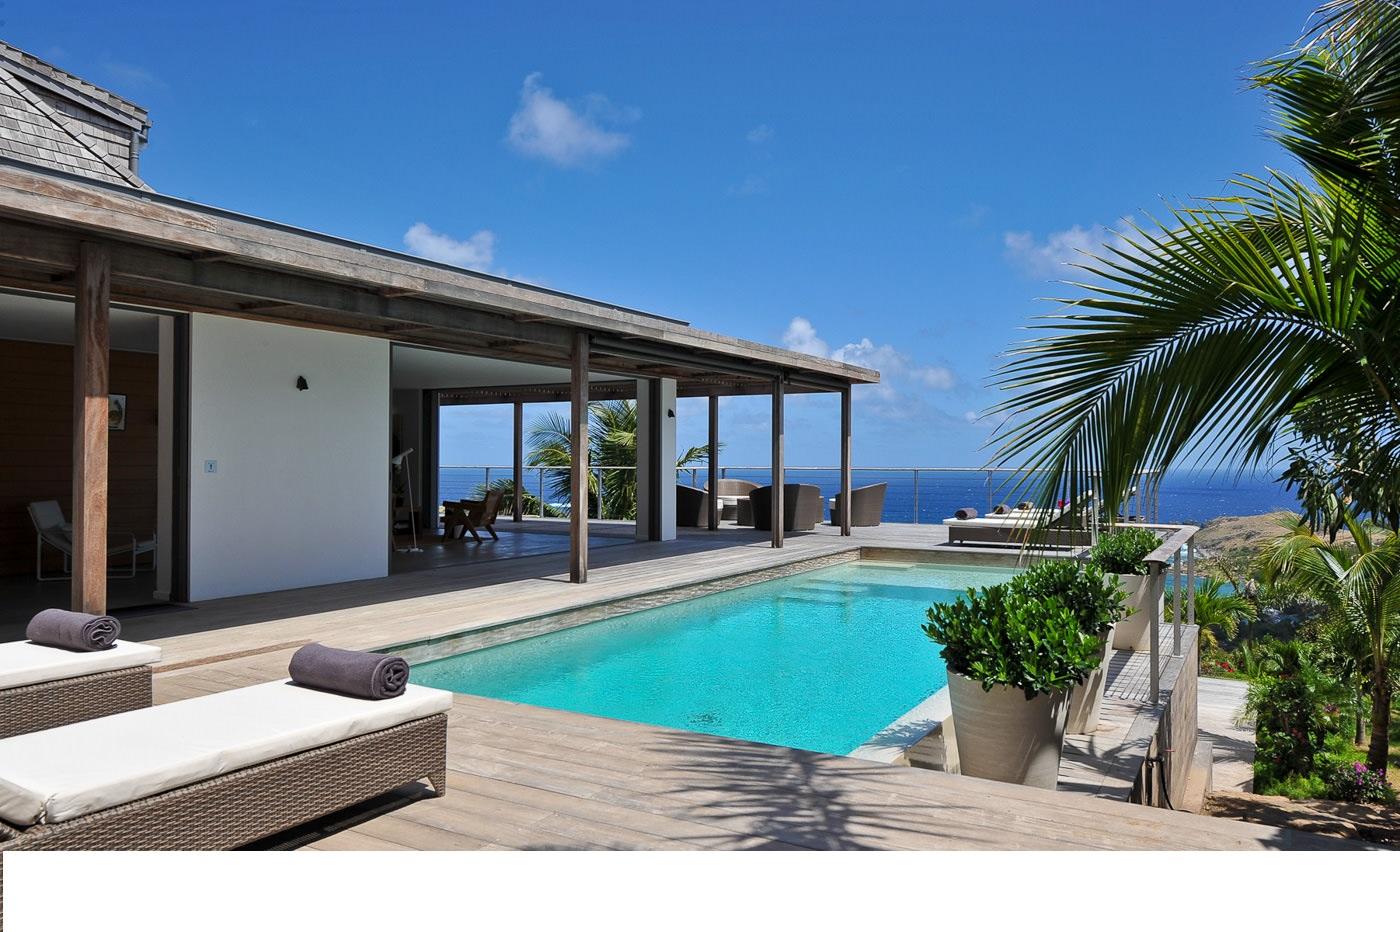 st barts villa rentals - st barthelemy villa rentals with private